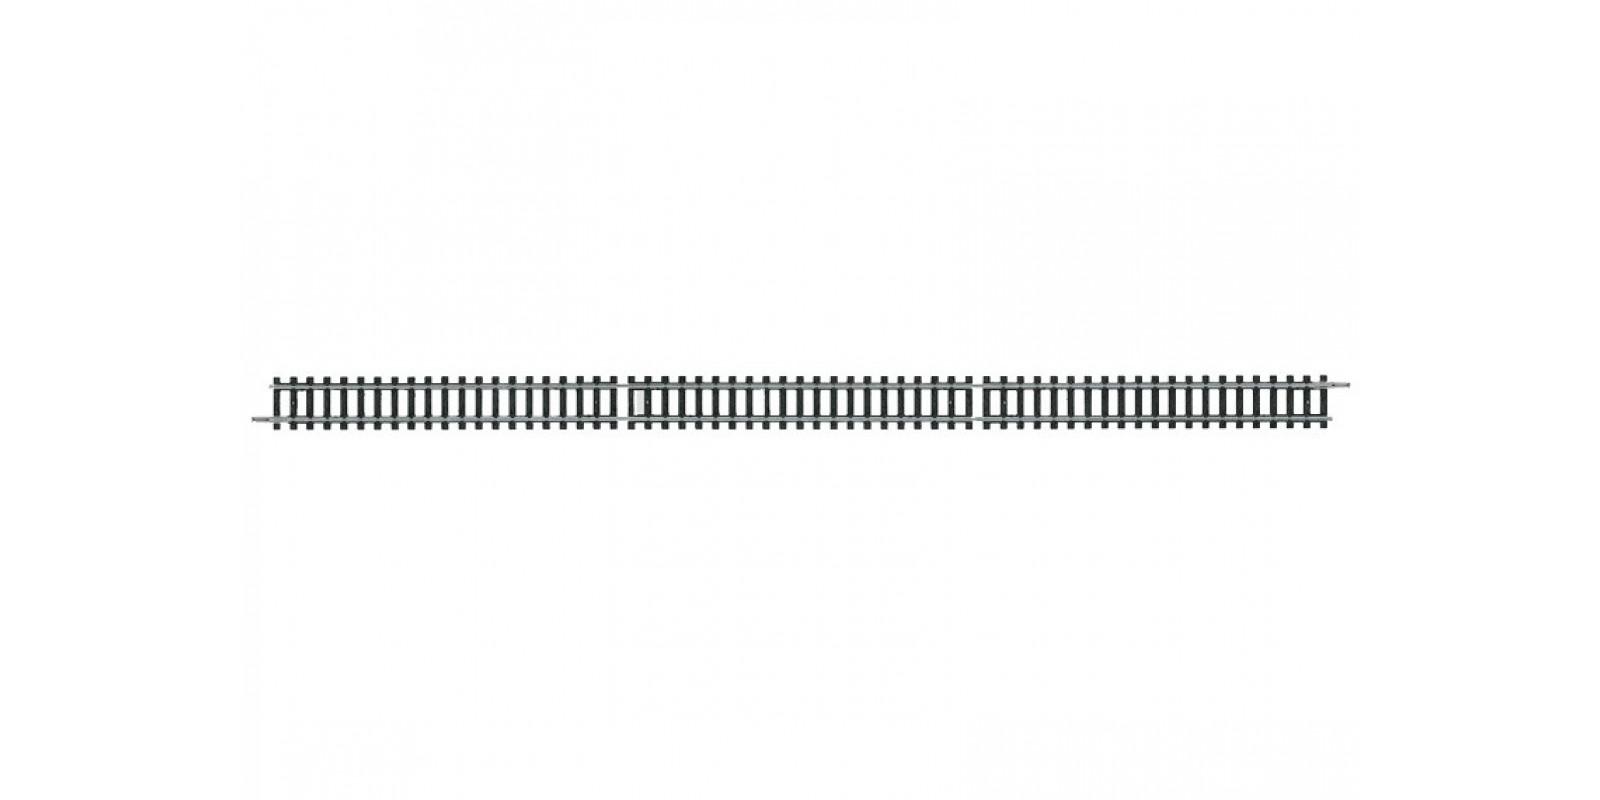 T14902 - Straight Track